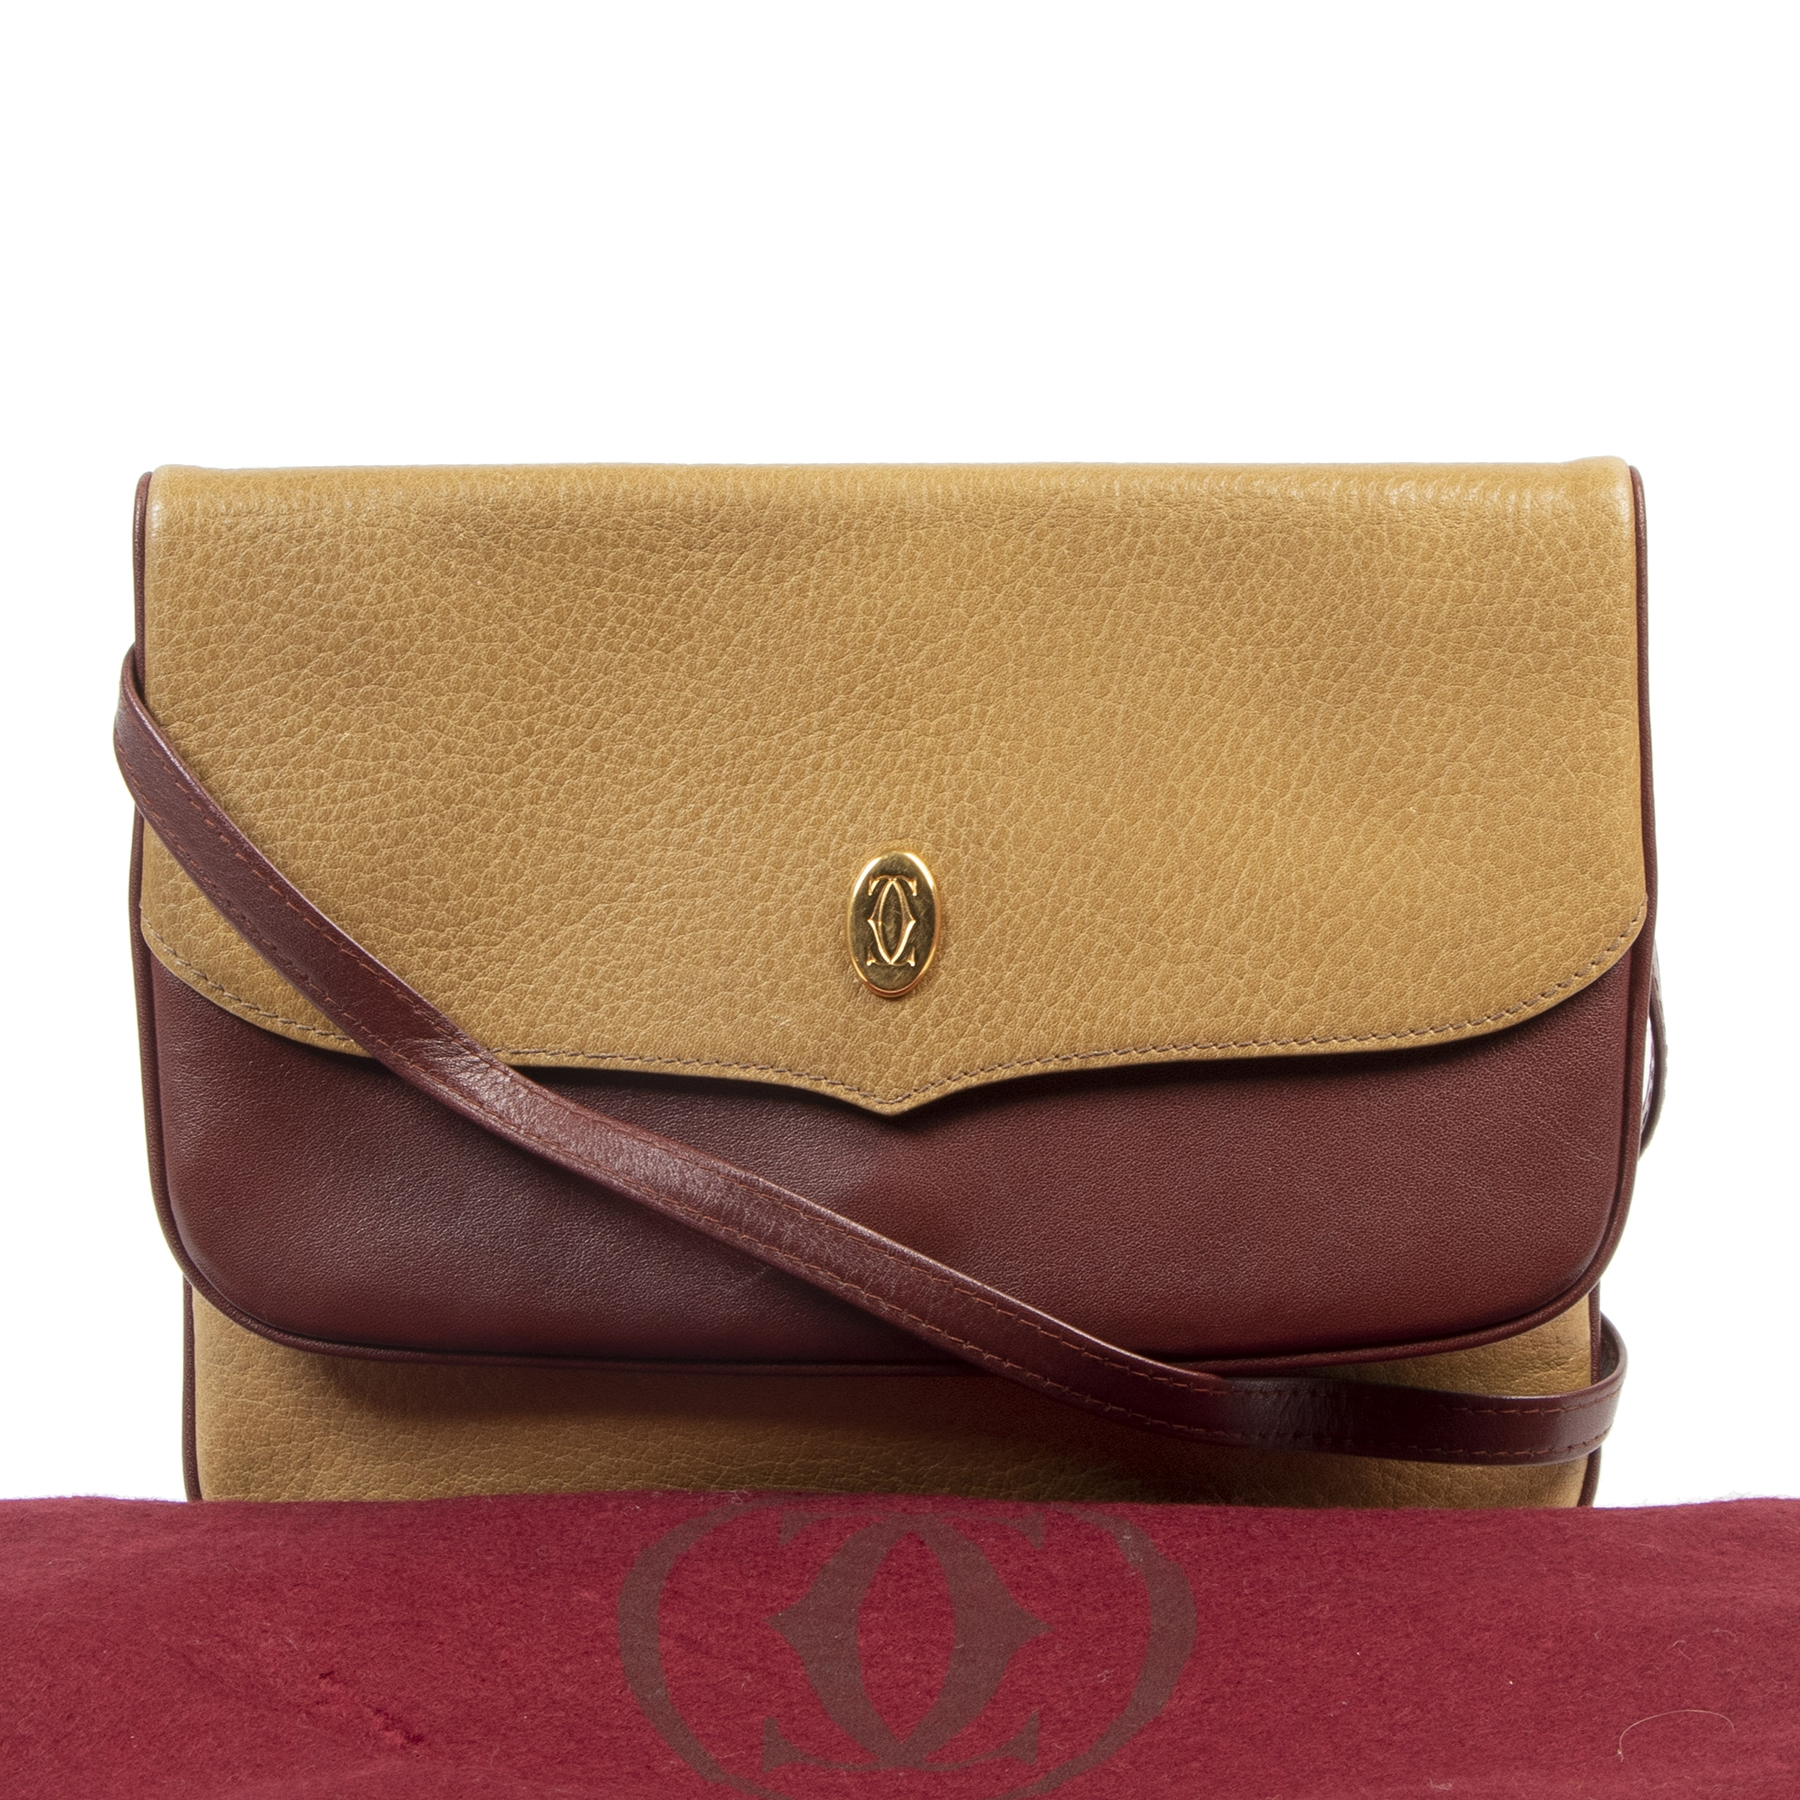 Cartier Brown Leather Must De Cartier Crossbody Bag